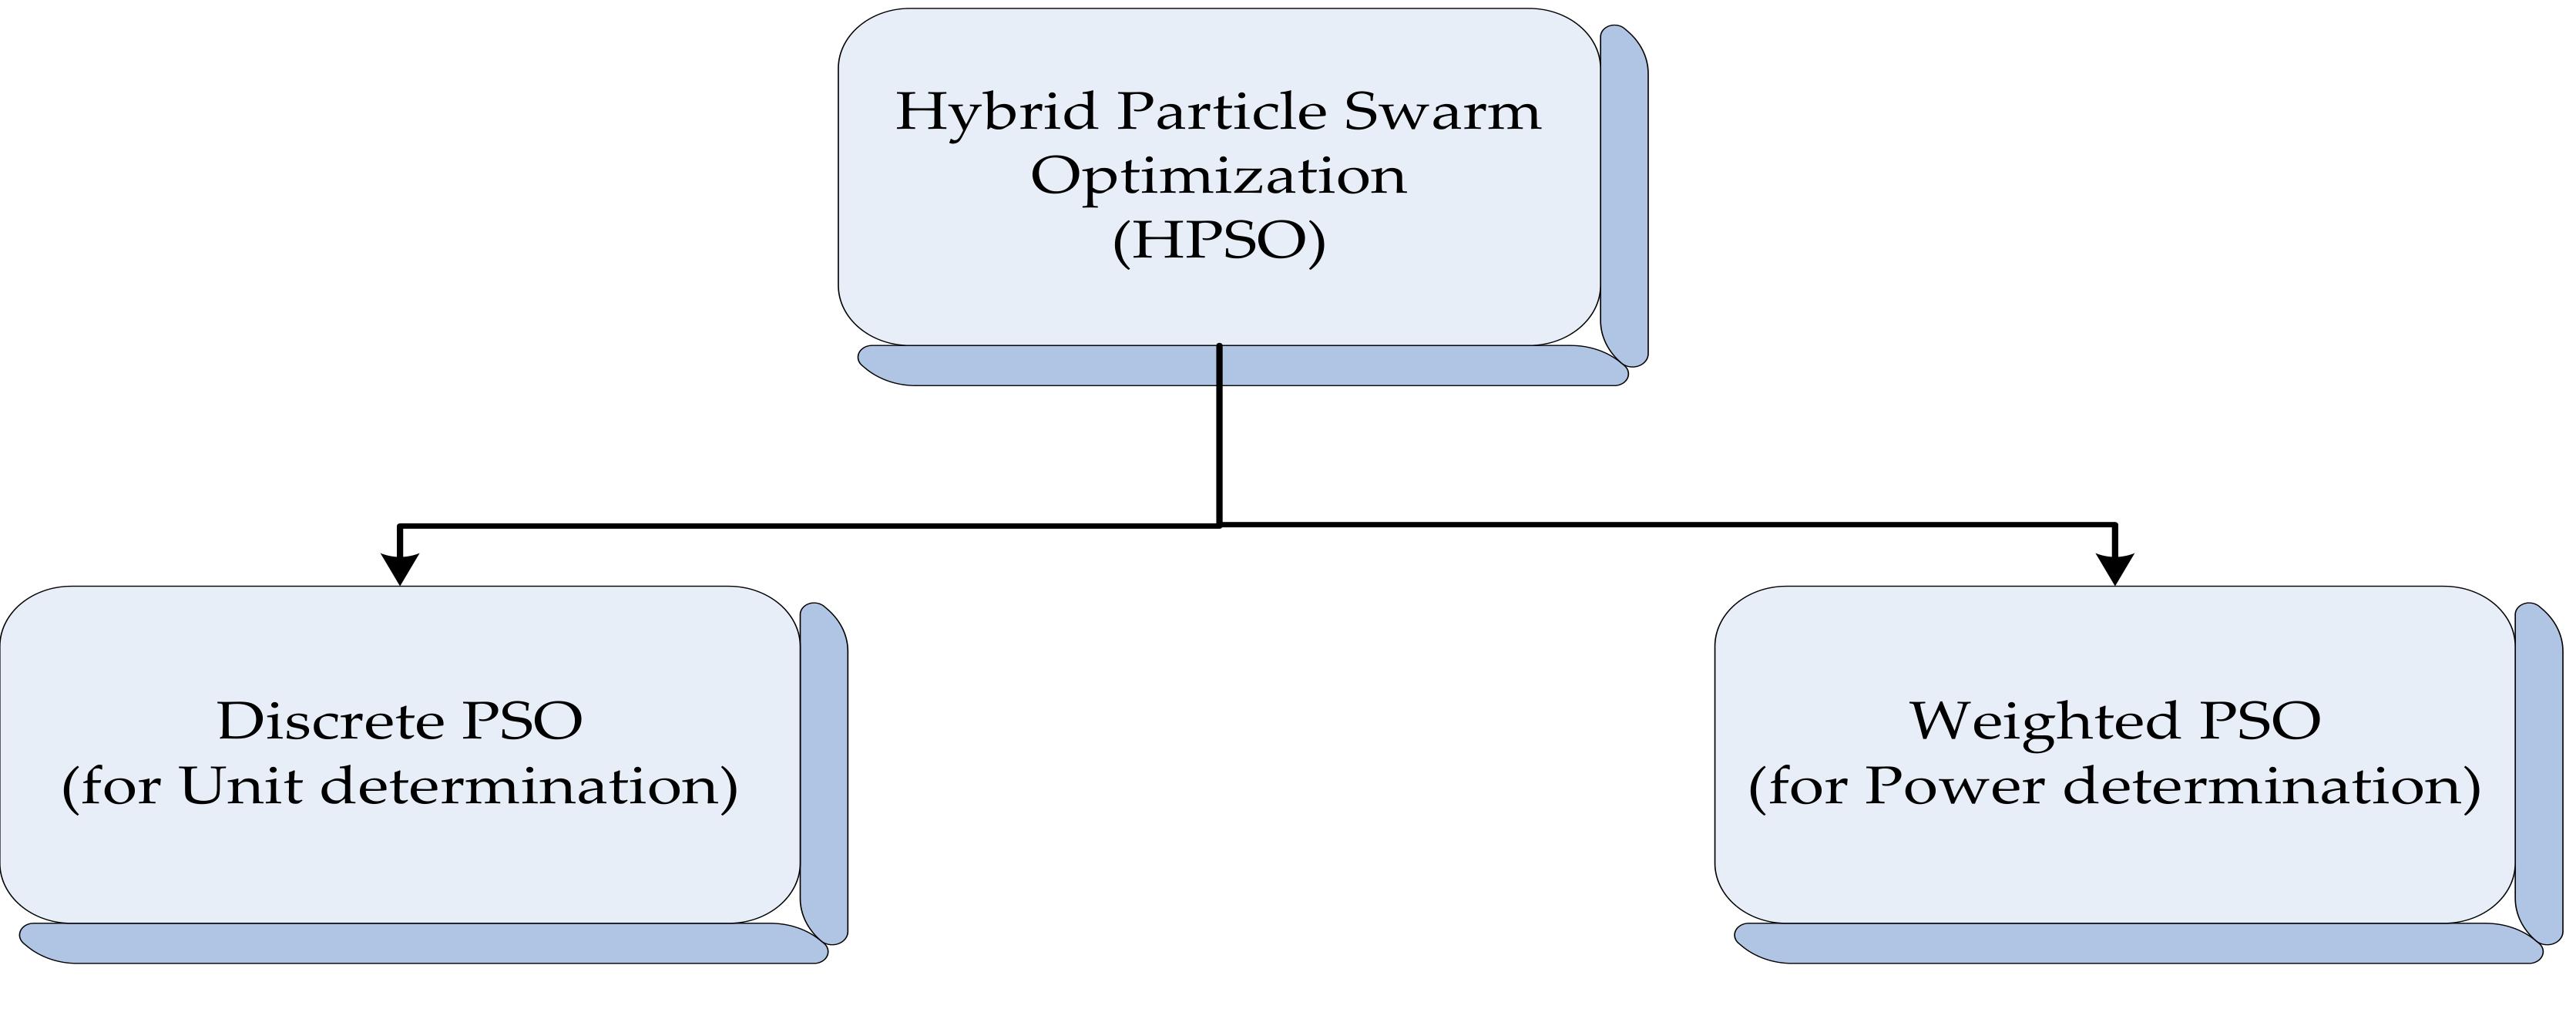 Sustainability | Free Full-Text | Smart Integration Based on Hybrid